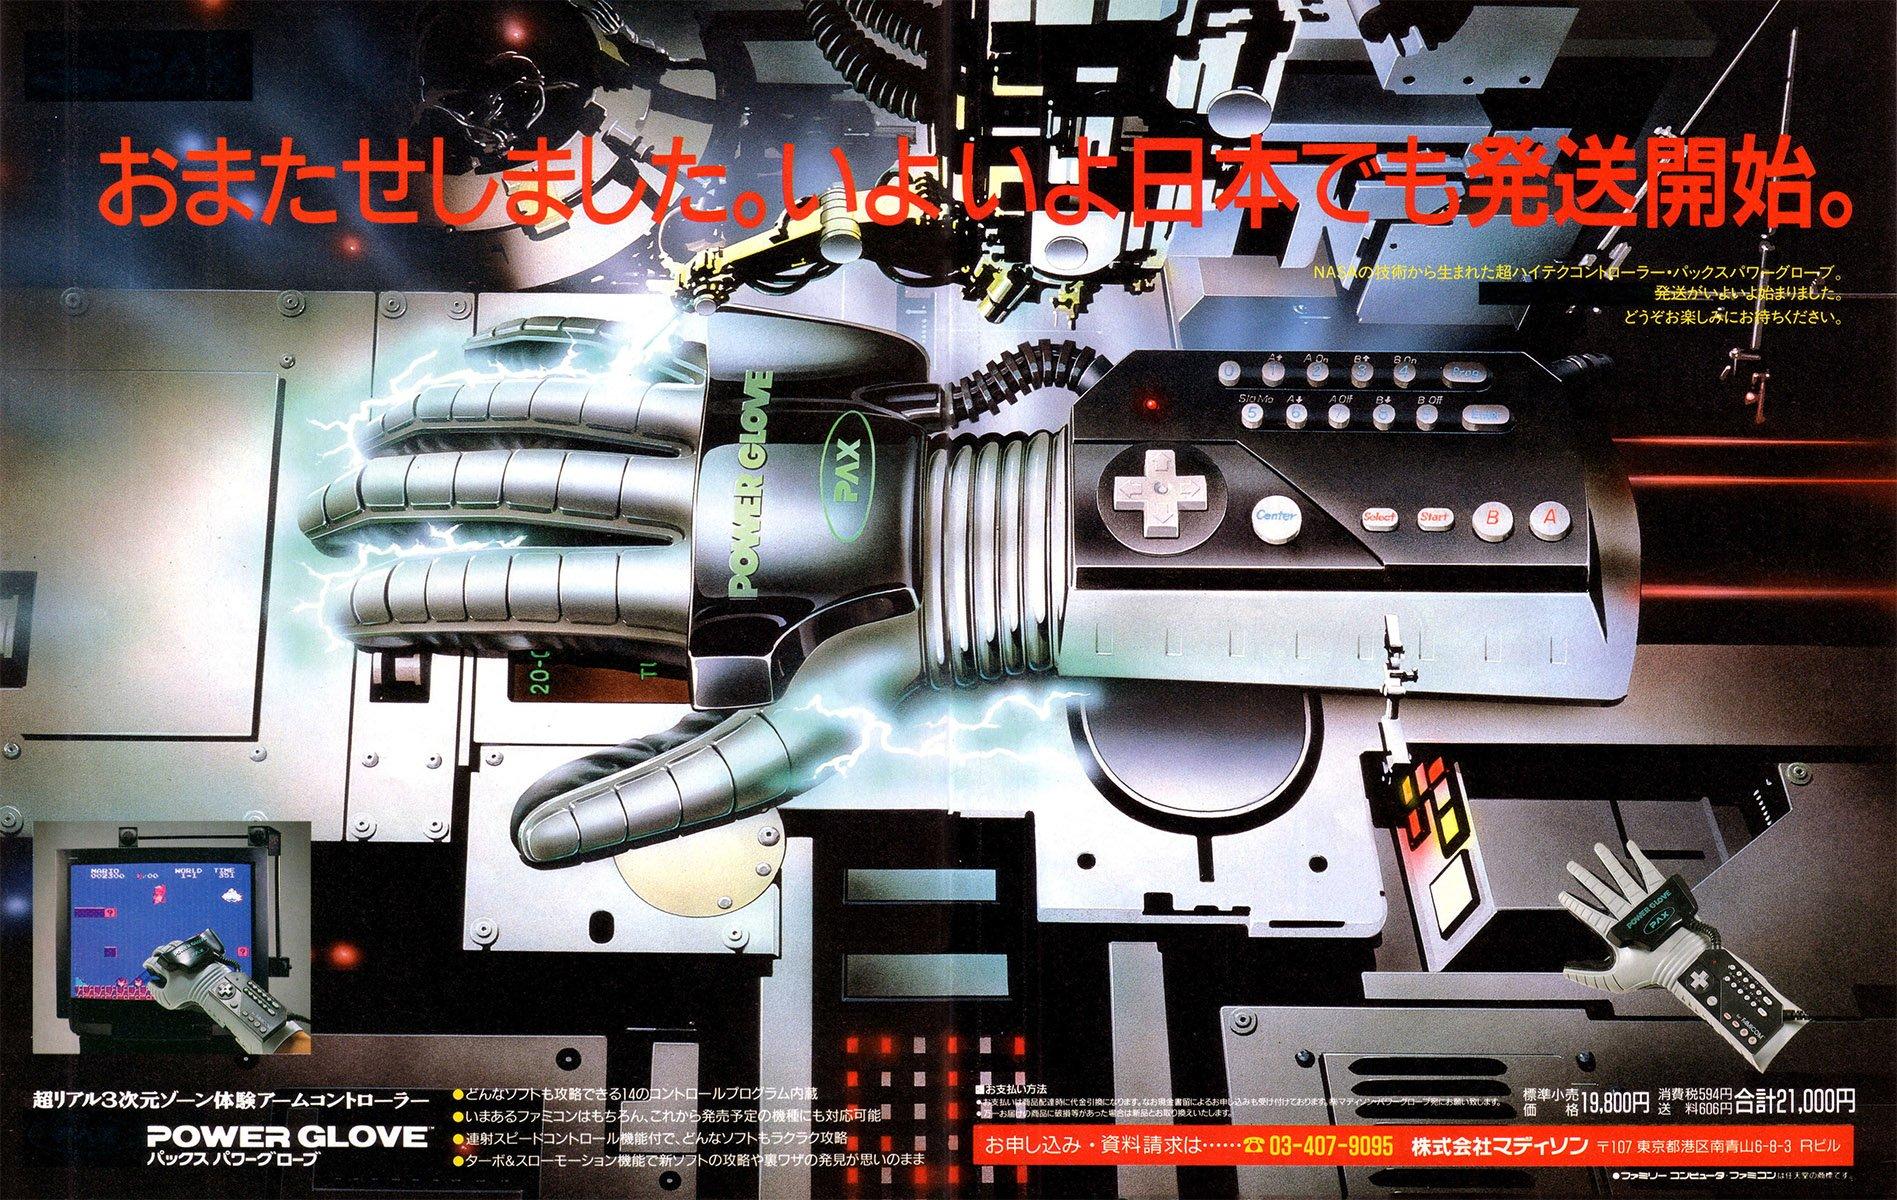 Power Glove (Japan)